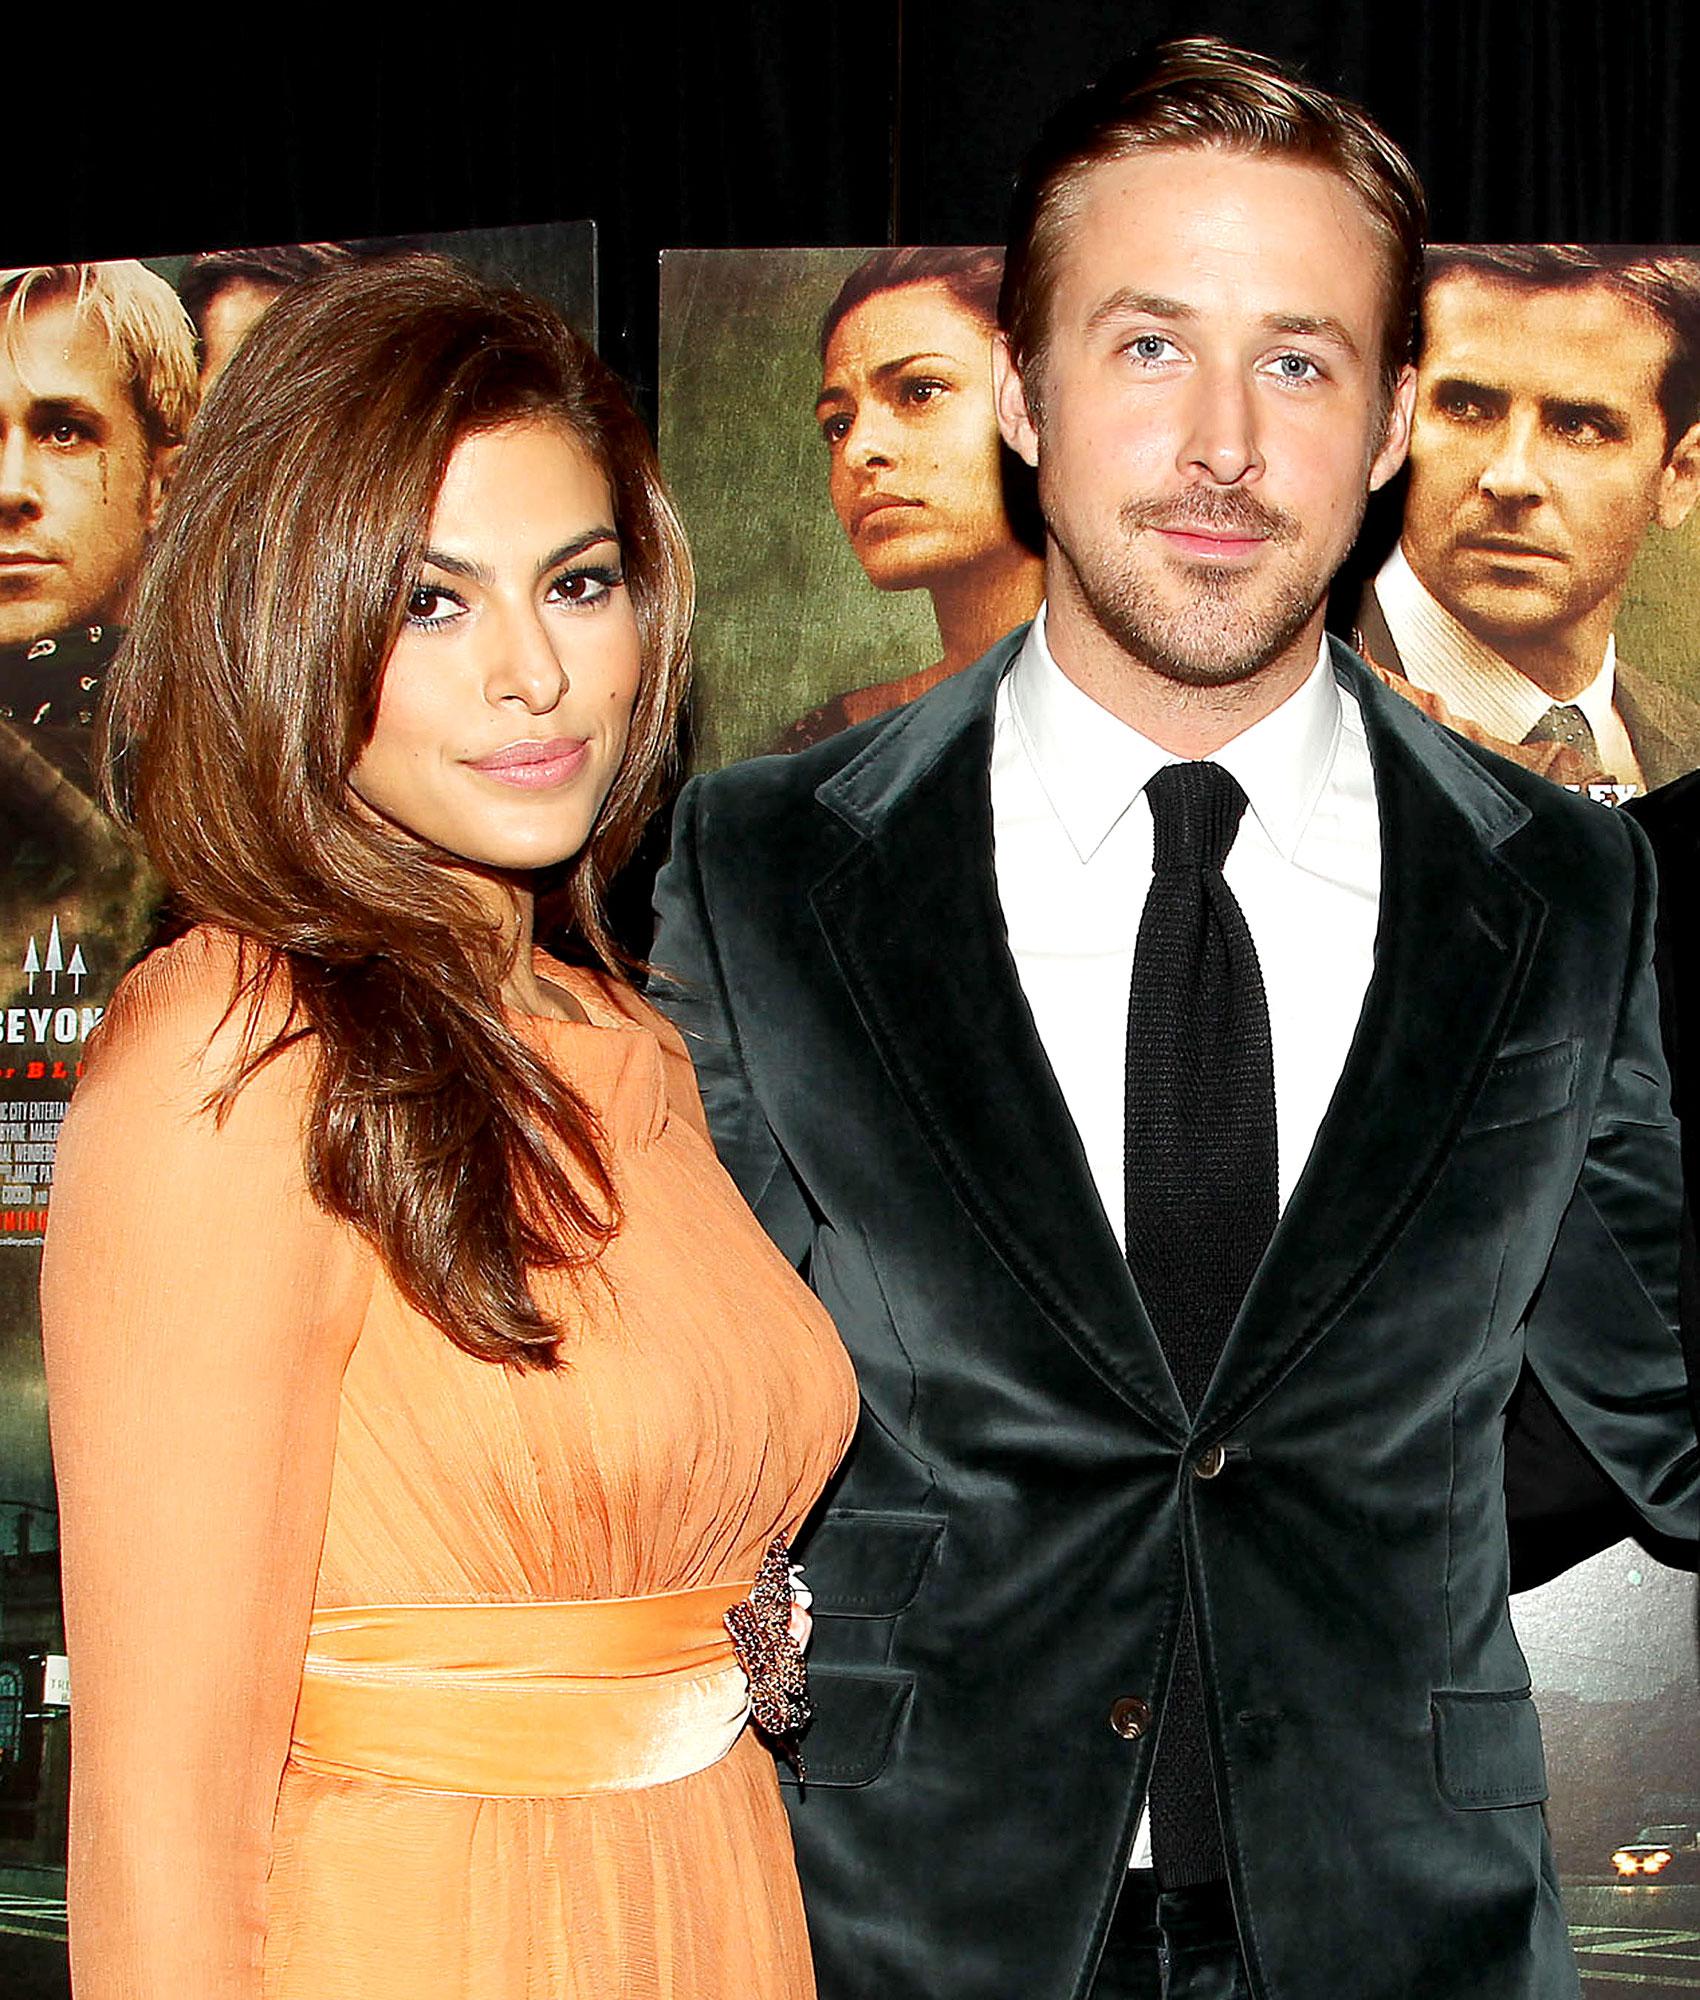 Ryan Gosling on Eva Mendes, Daughters Esmeralda and Amada: 'It's Like a Dream'